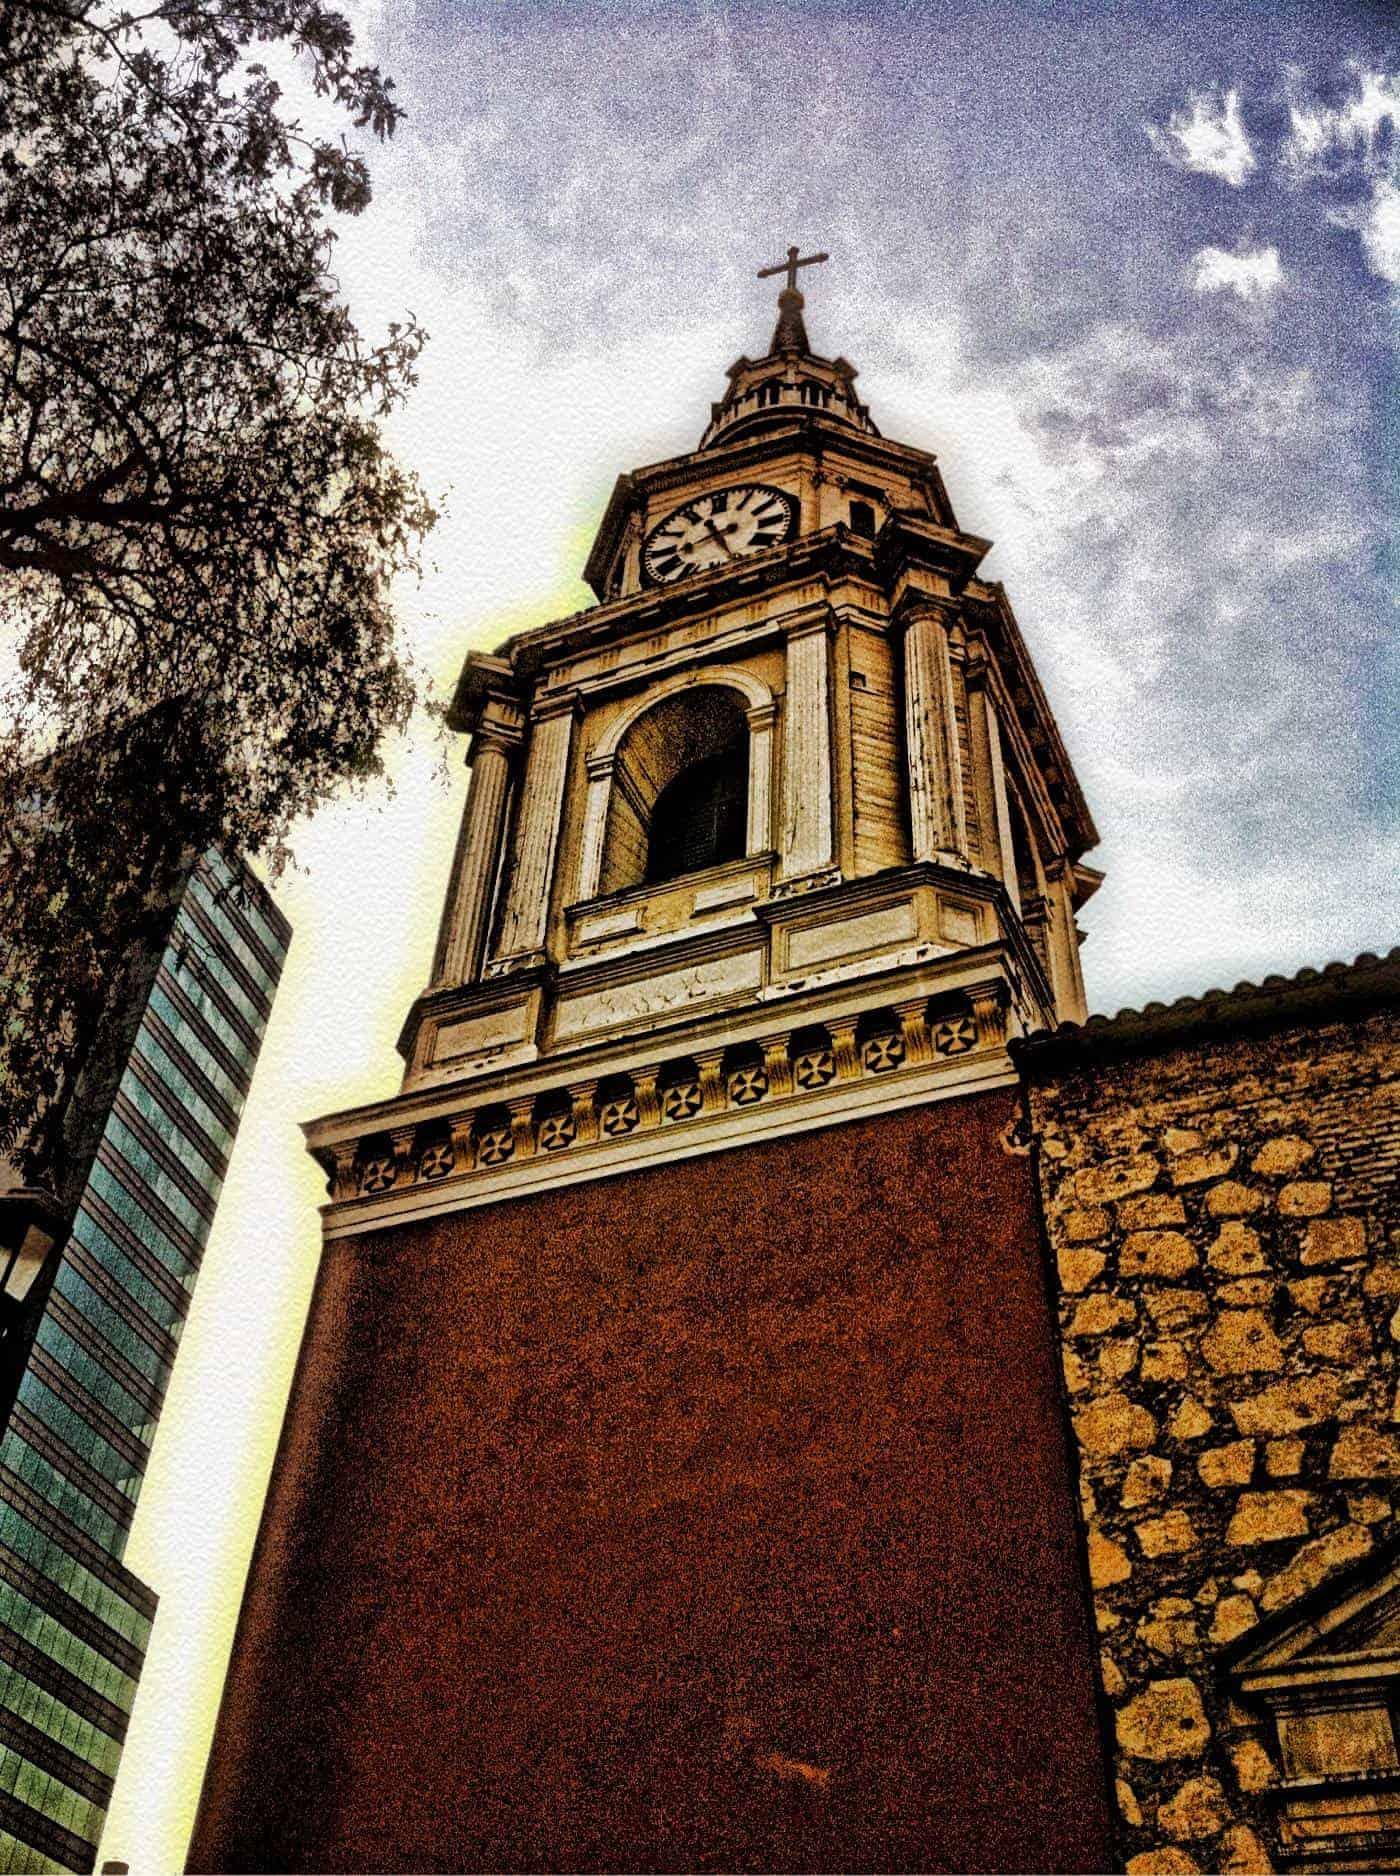 santiago_essential_point7_Torre_Iglesia_San_Francisco_,_Santiago_de_Chile